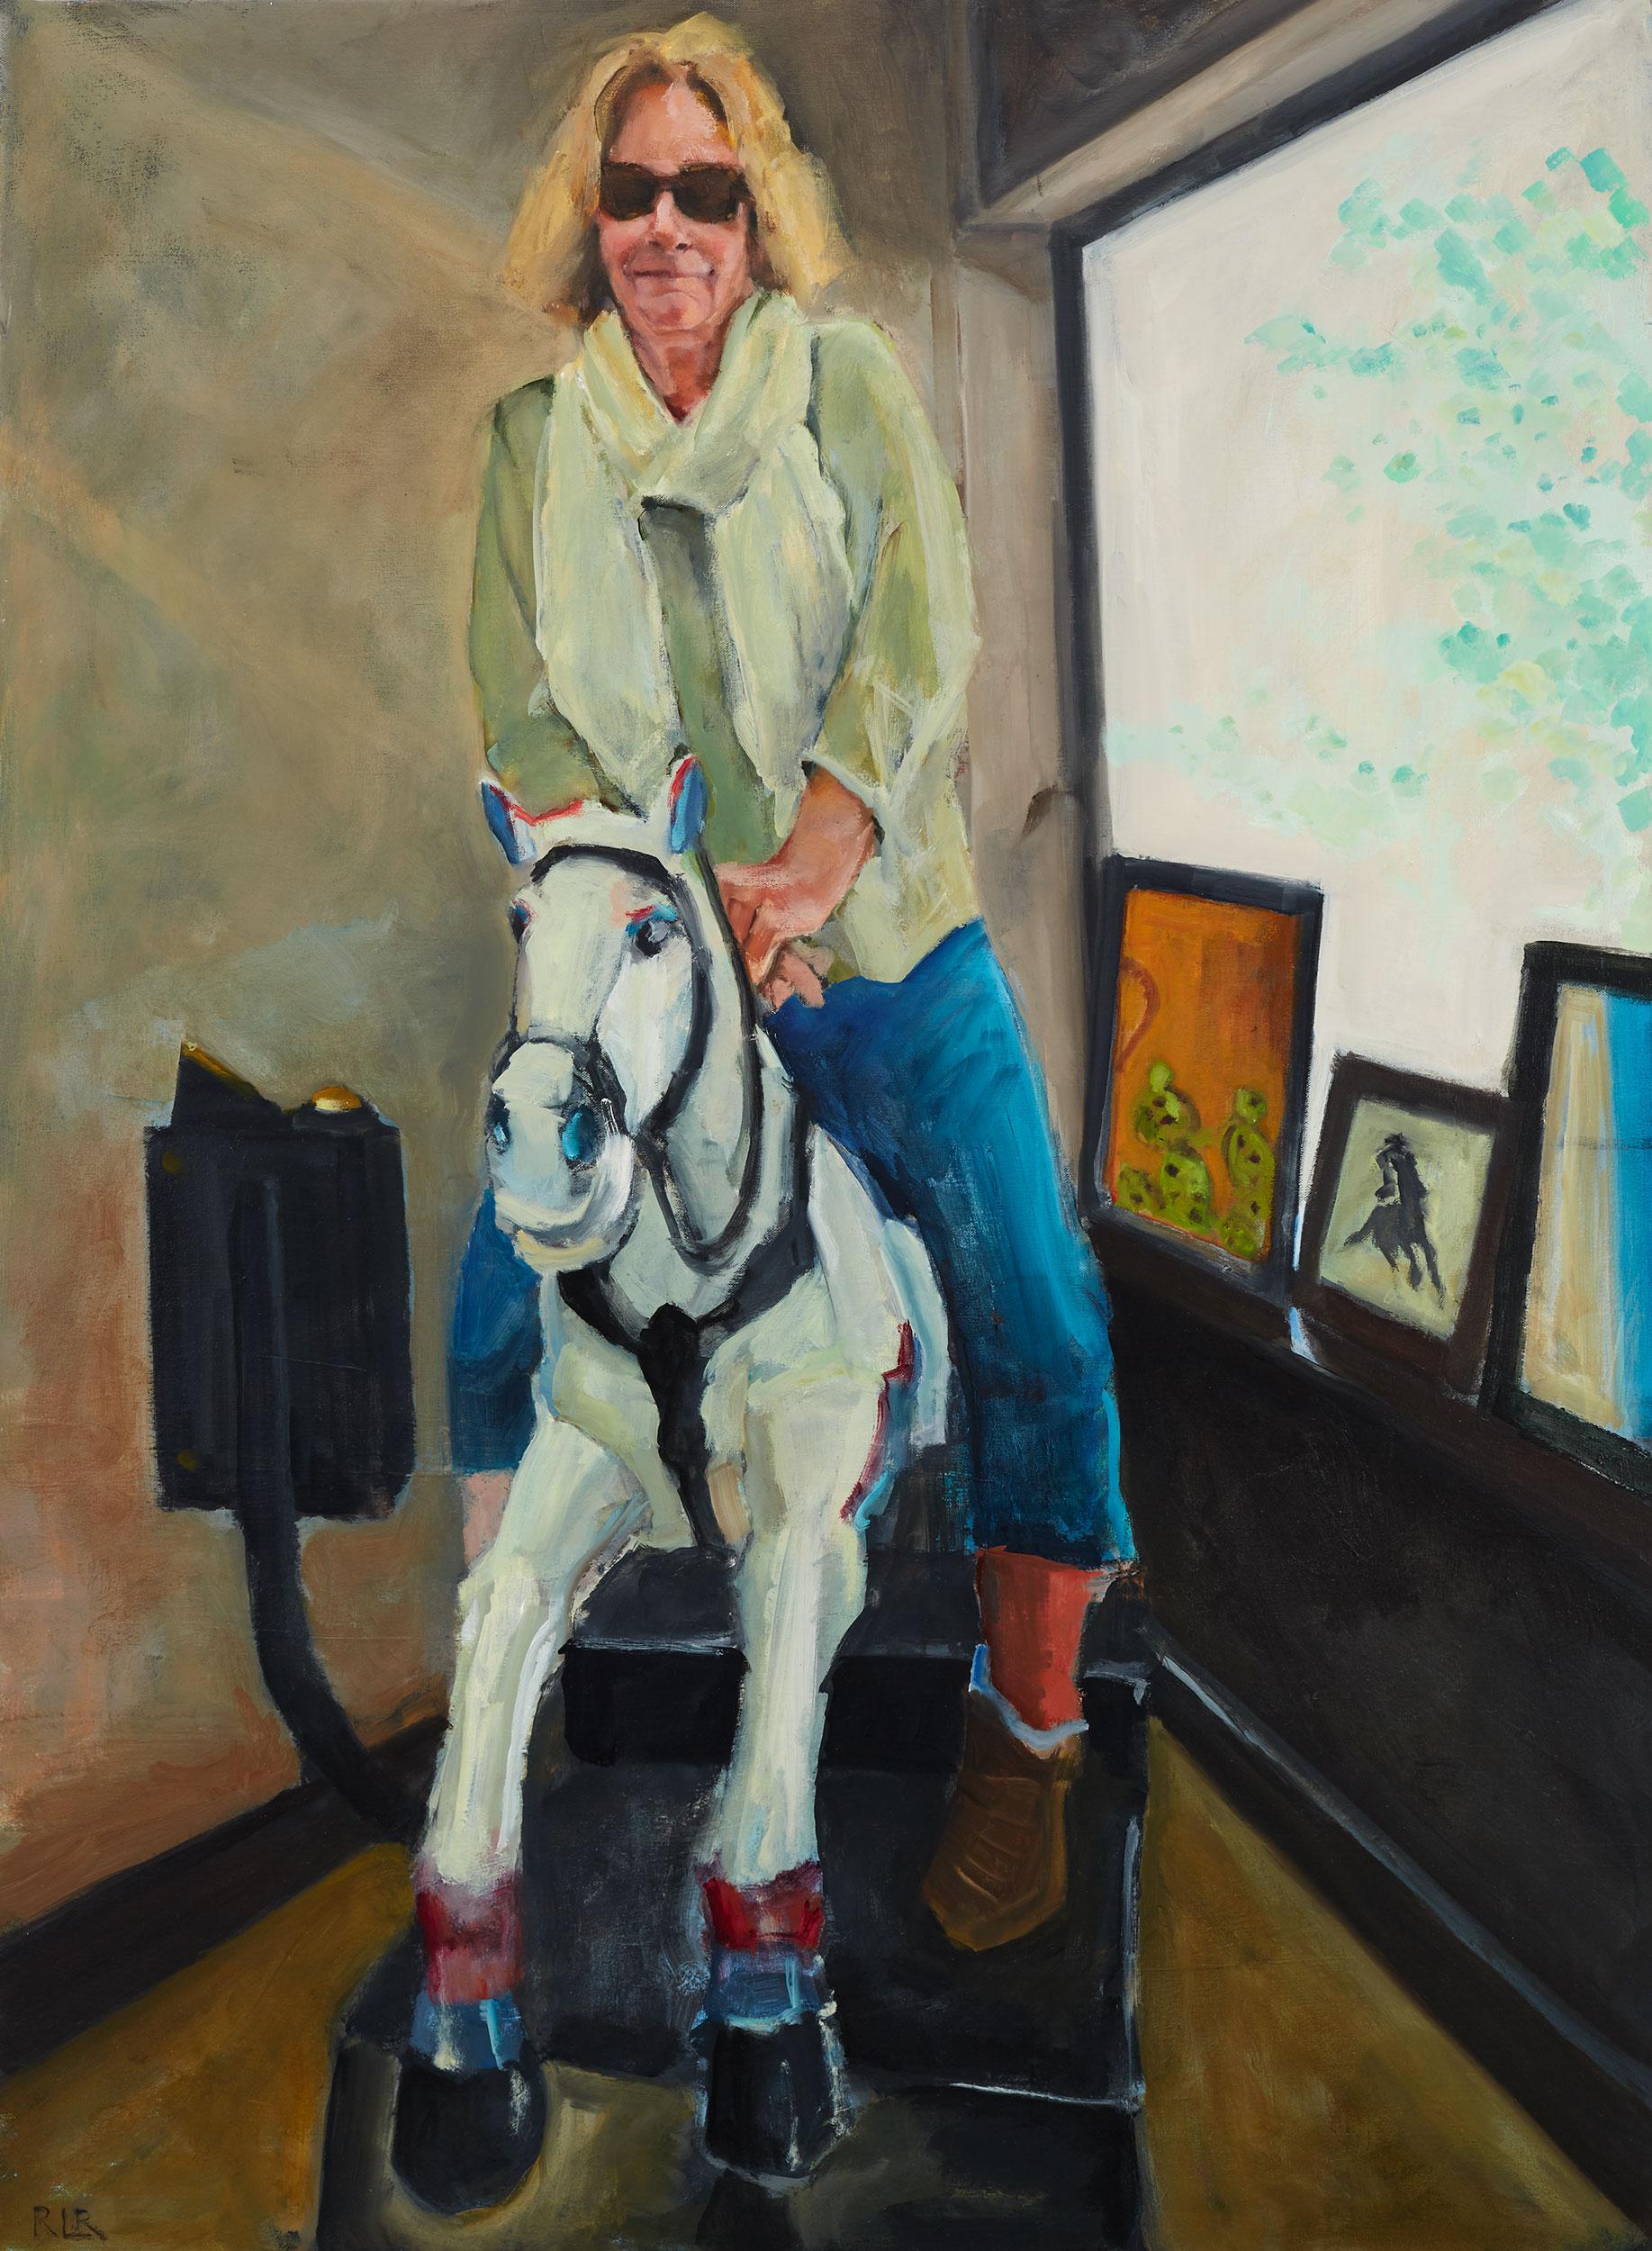 Drugstore Cowgirl 2016